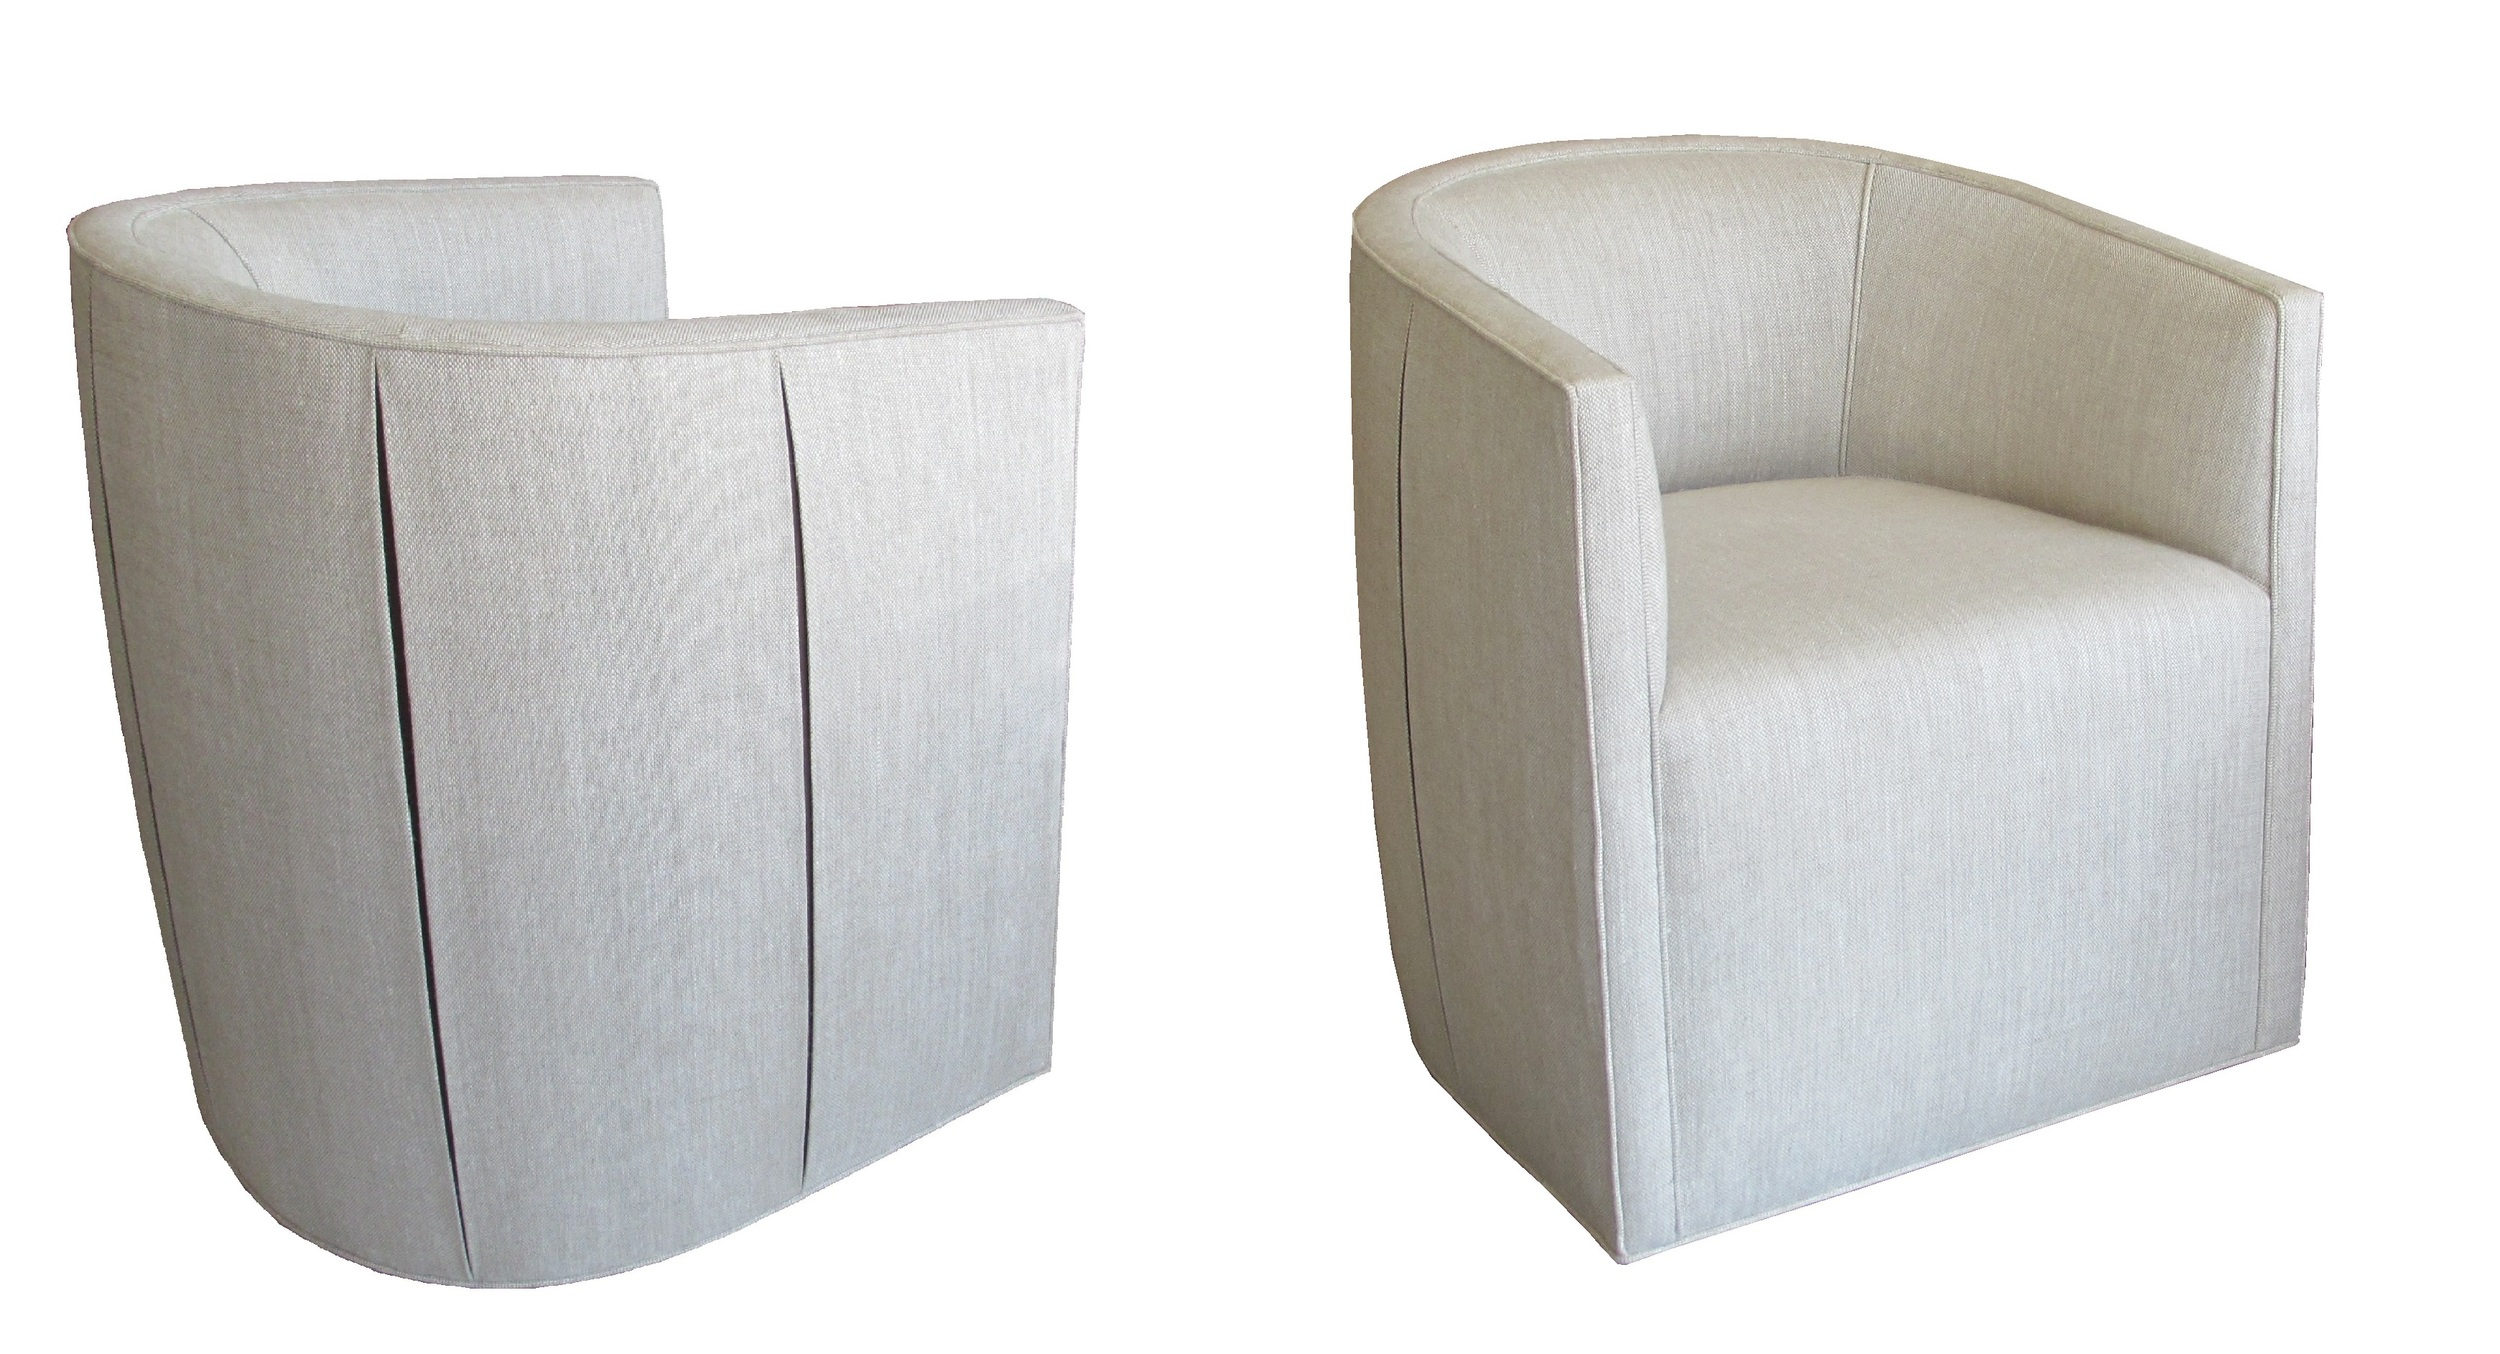 603 Barrel Chair